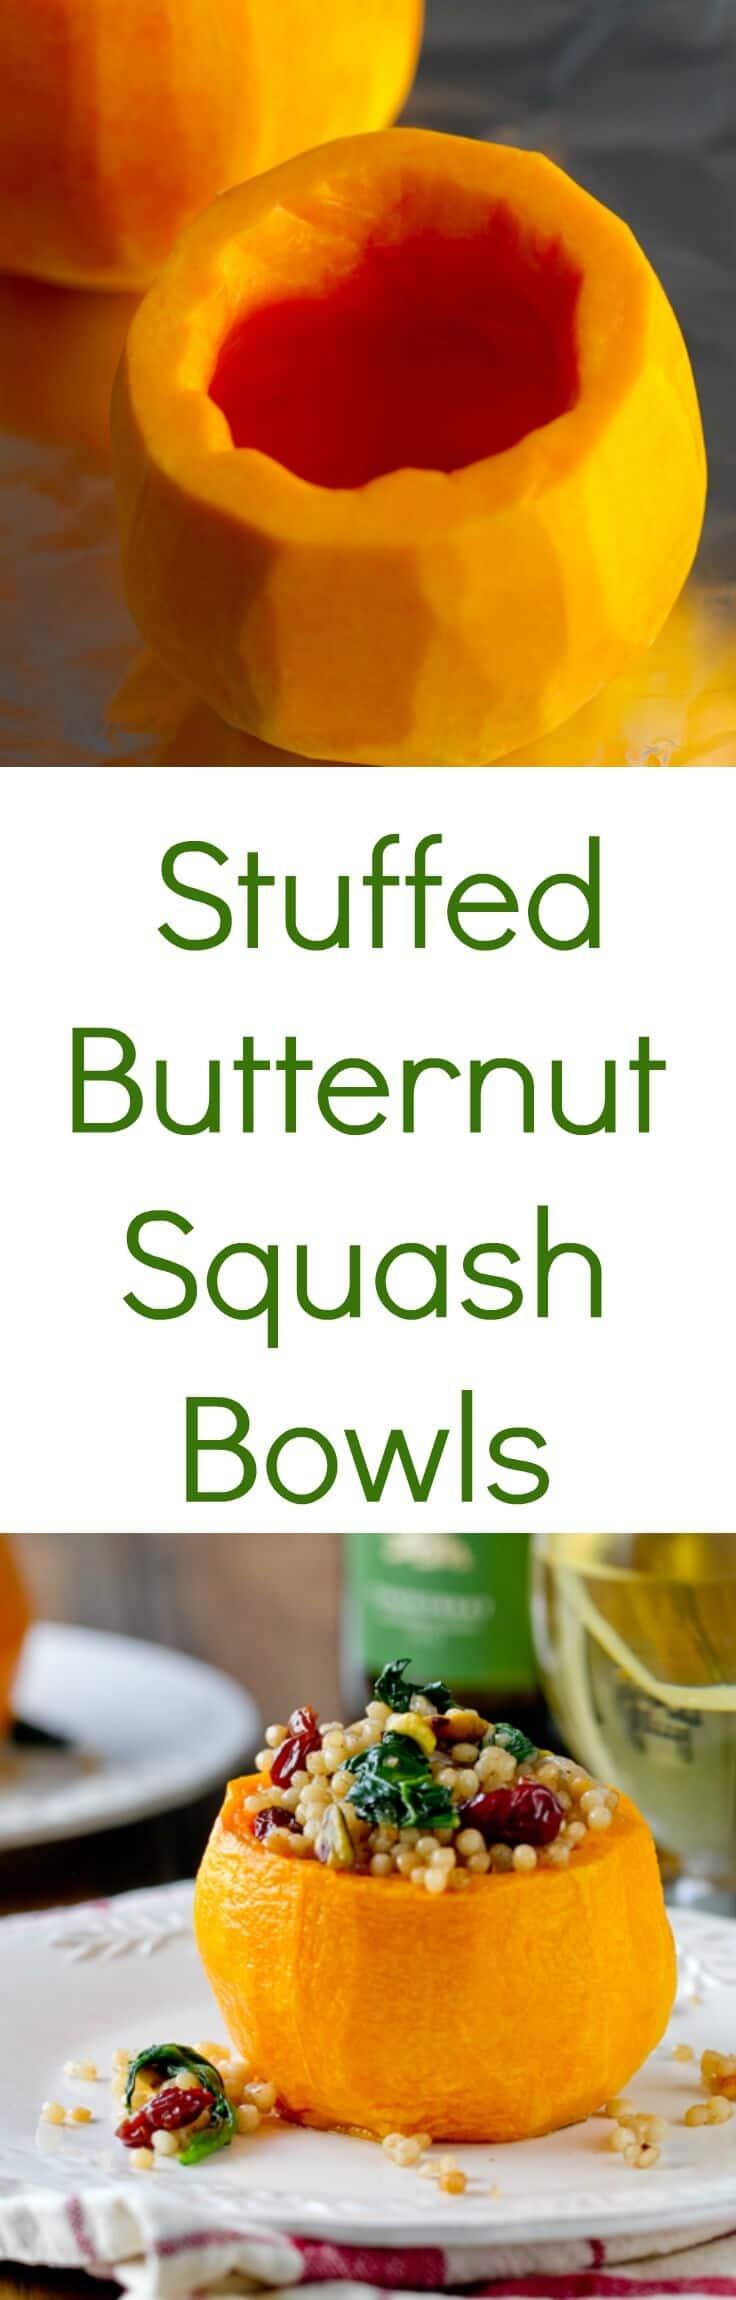 Stuffed Butternut Squash bowls